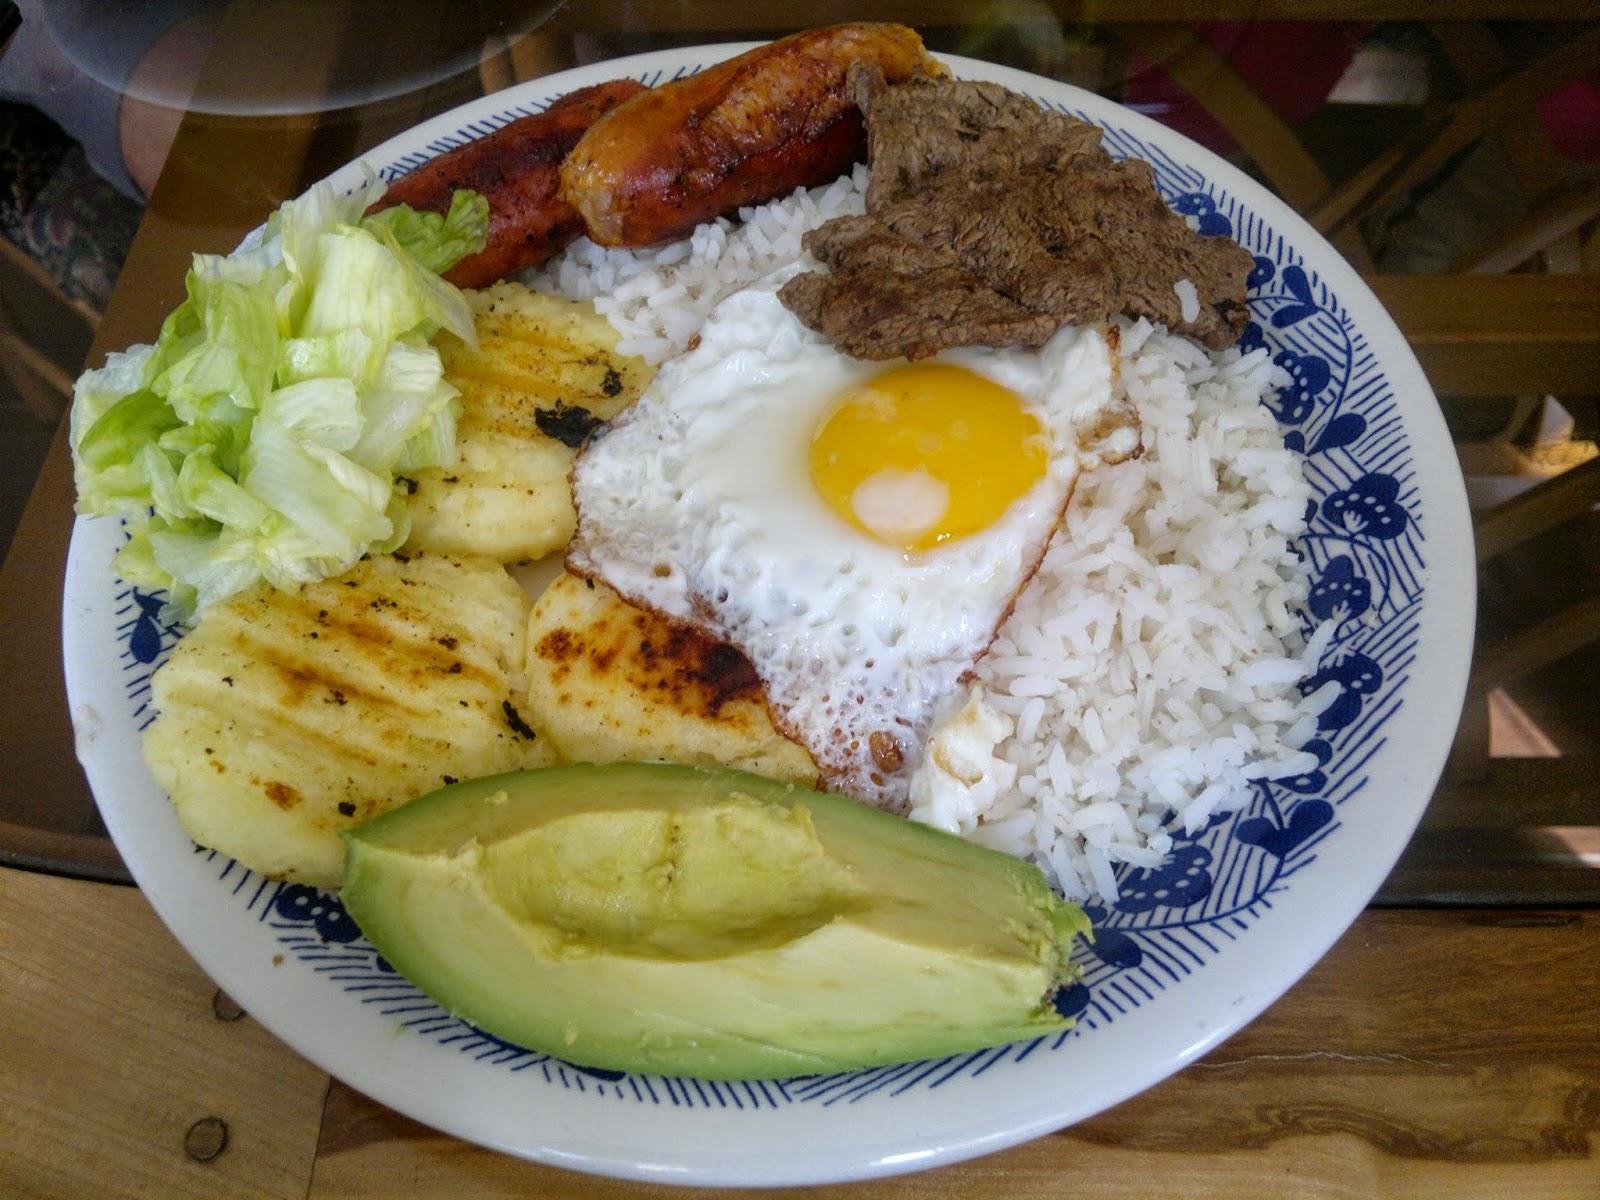 Recetas de cocina ecuatoriana mayo 2015 for Ingredientes para comida